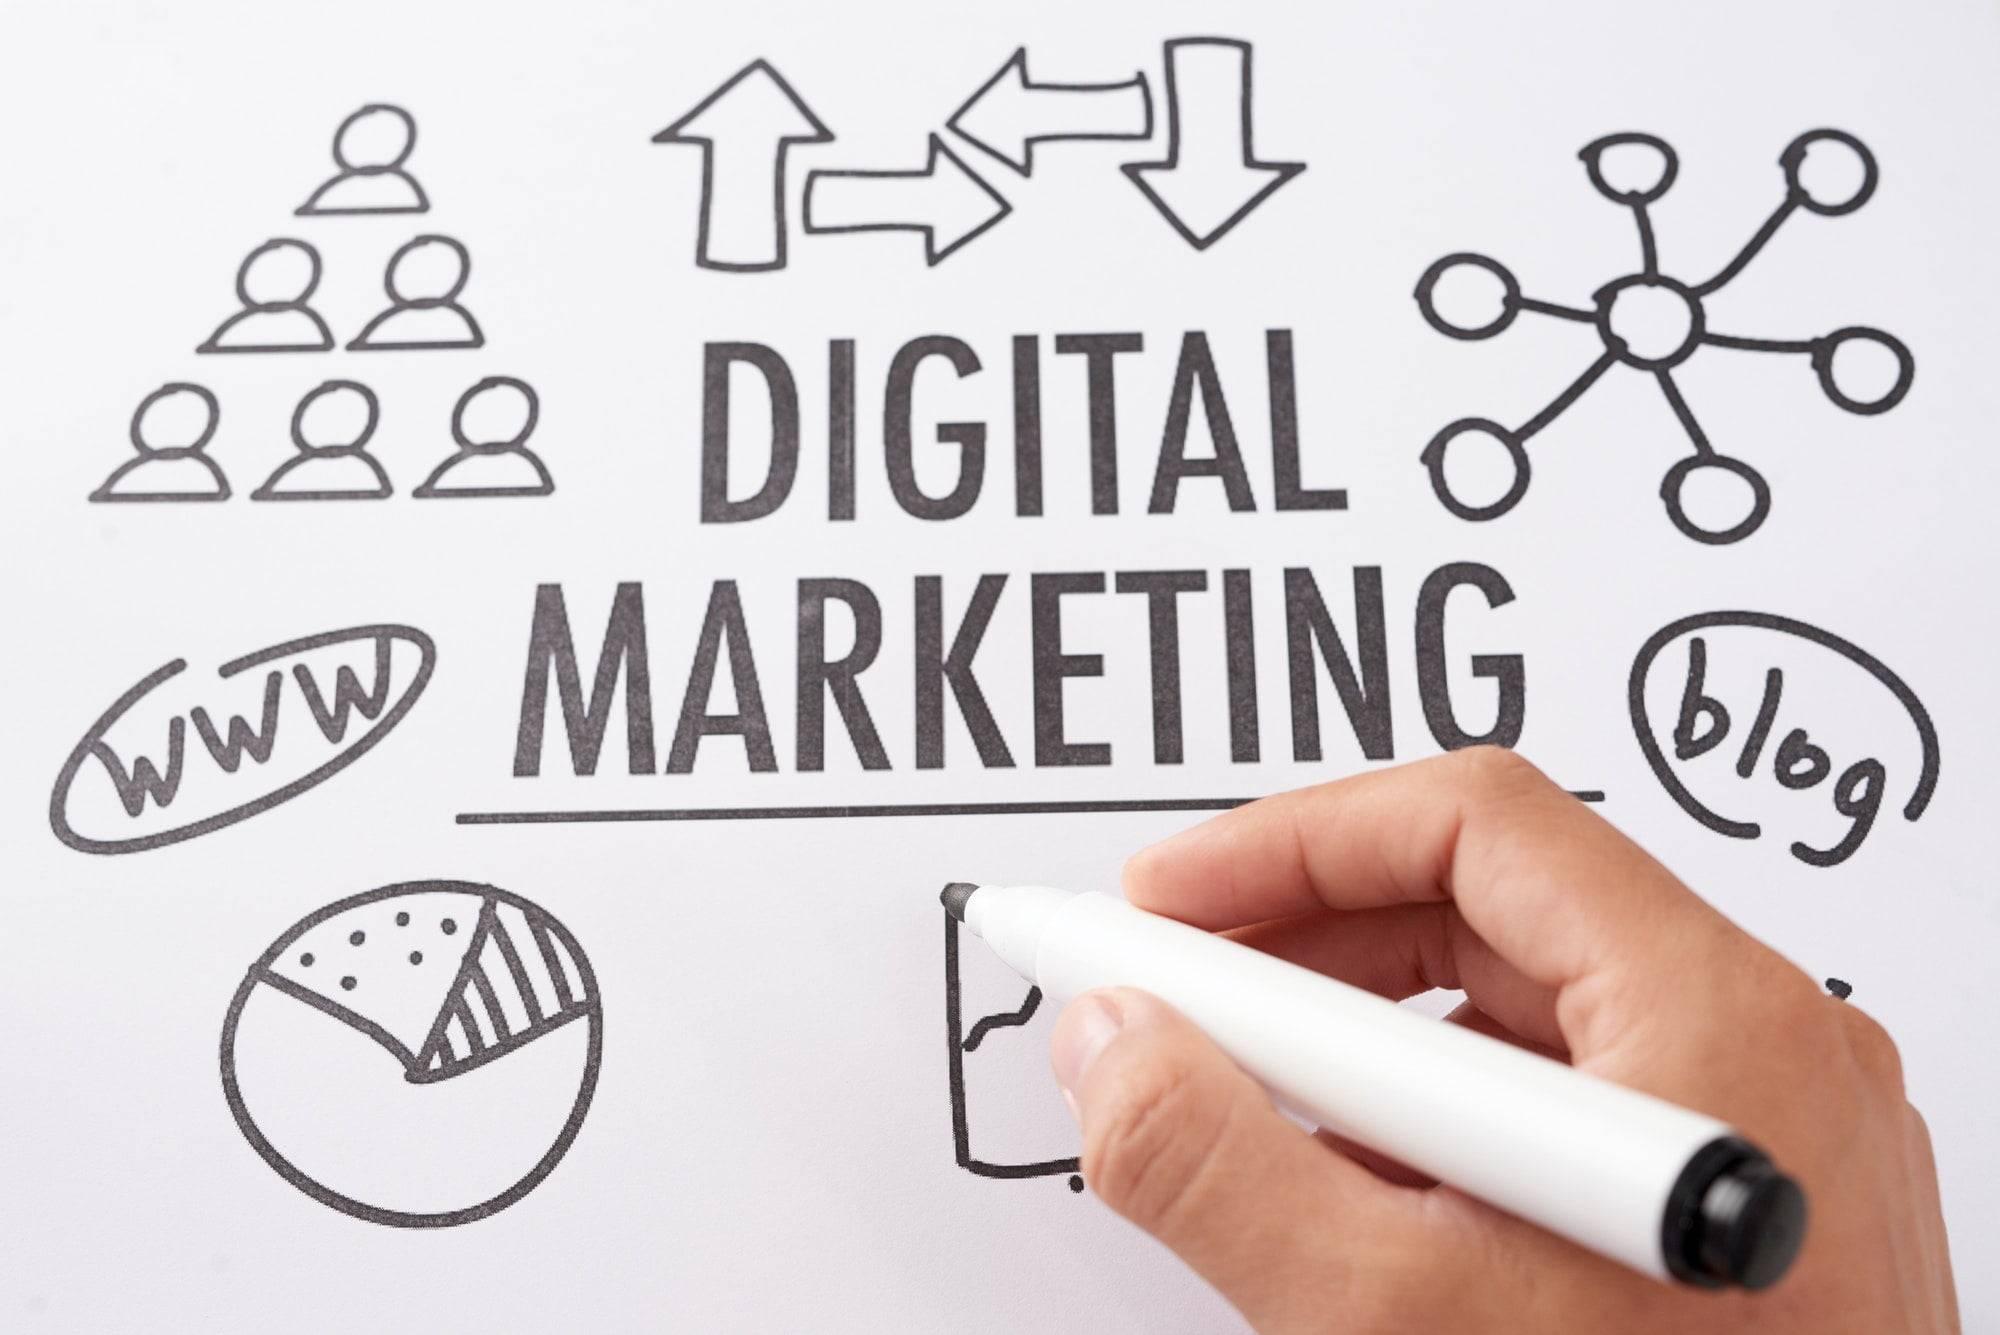 Crop hand drawing digital marketing plan